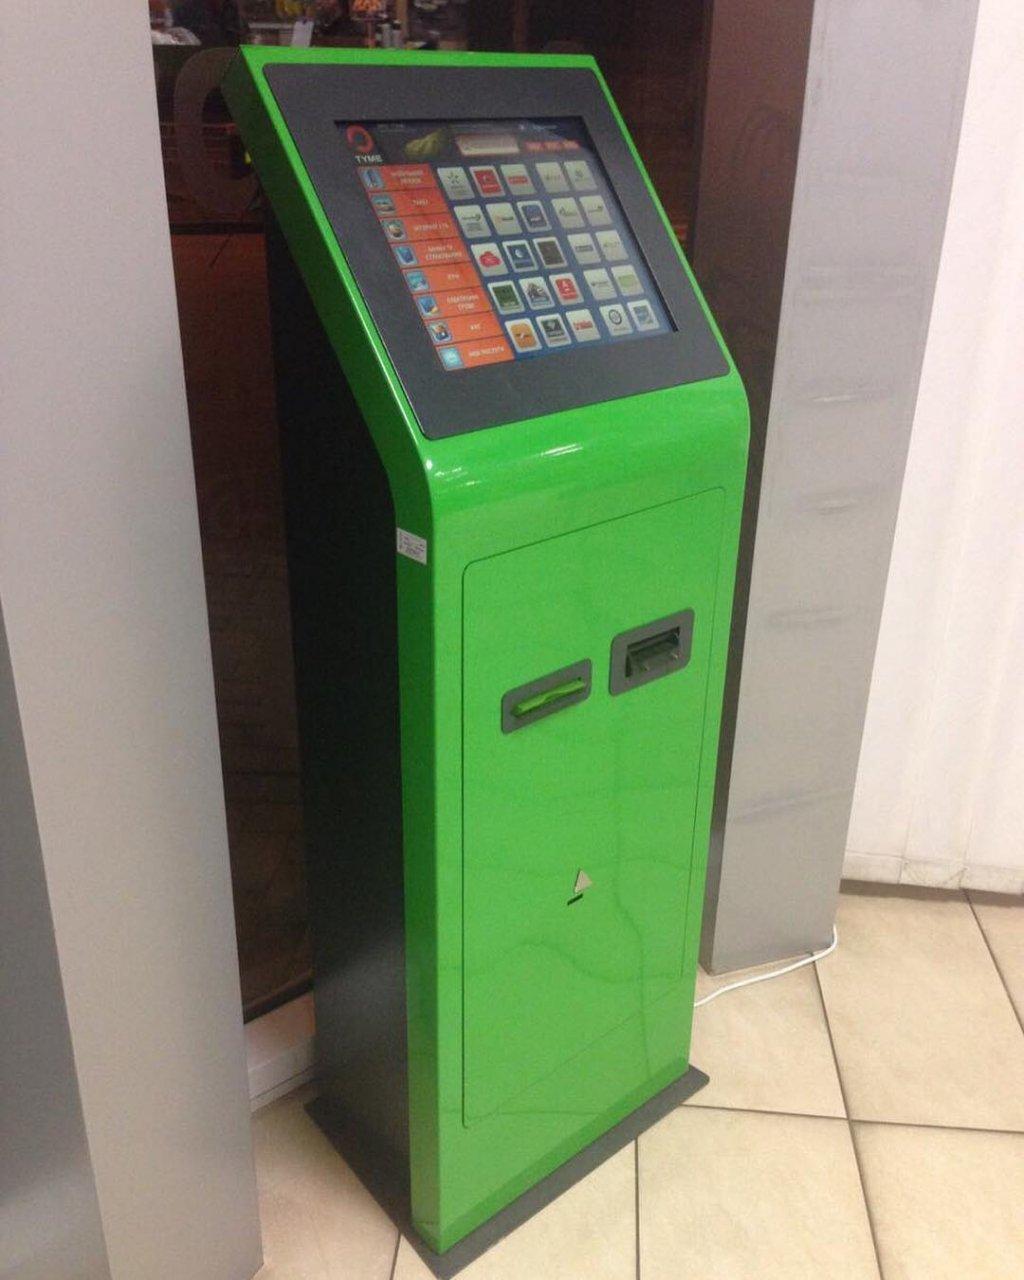 Moneybox - Для меня moneybox лучшие